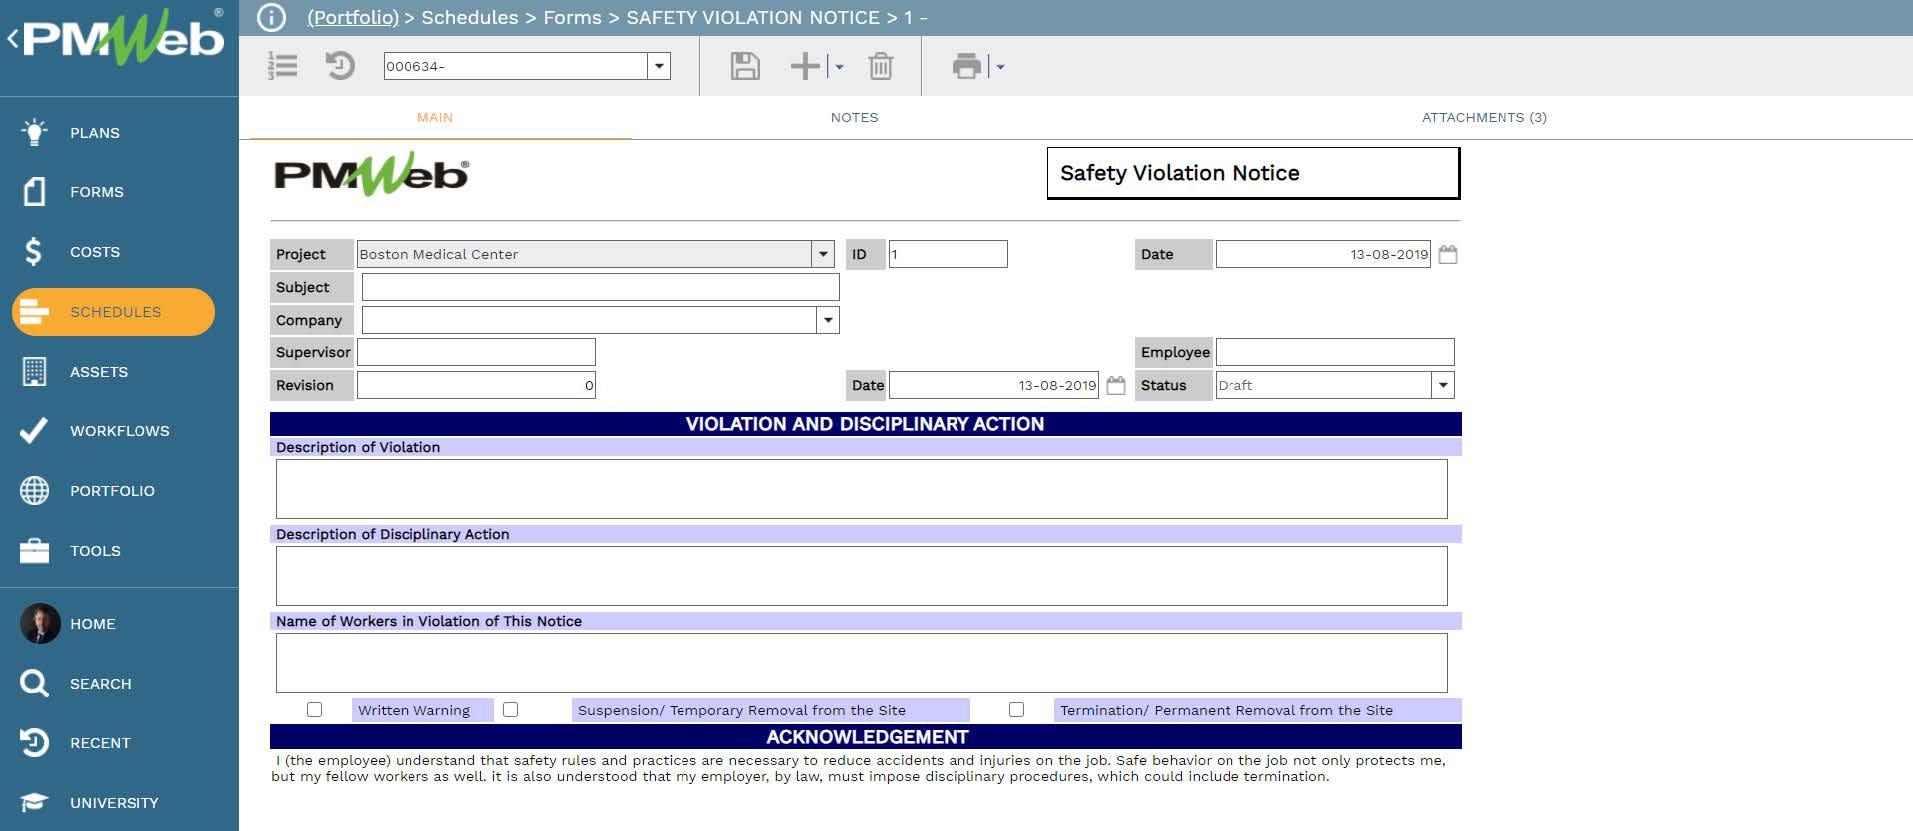 PMWeb 7 Schedules Forms Safety Violation Notice Main